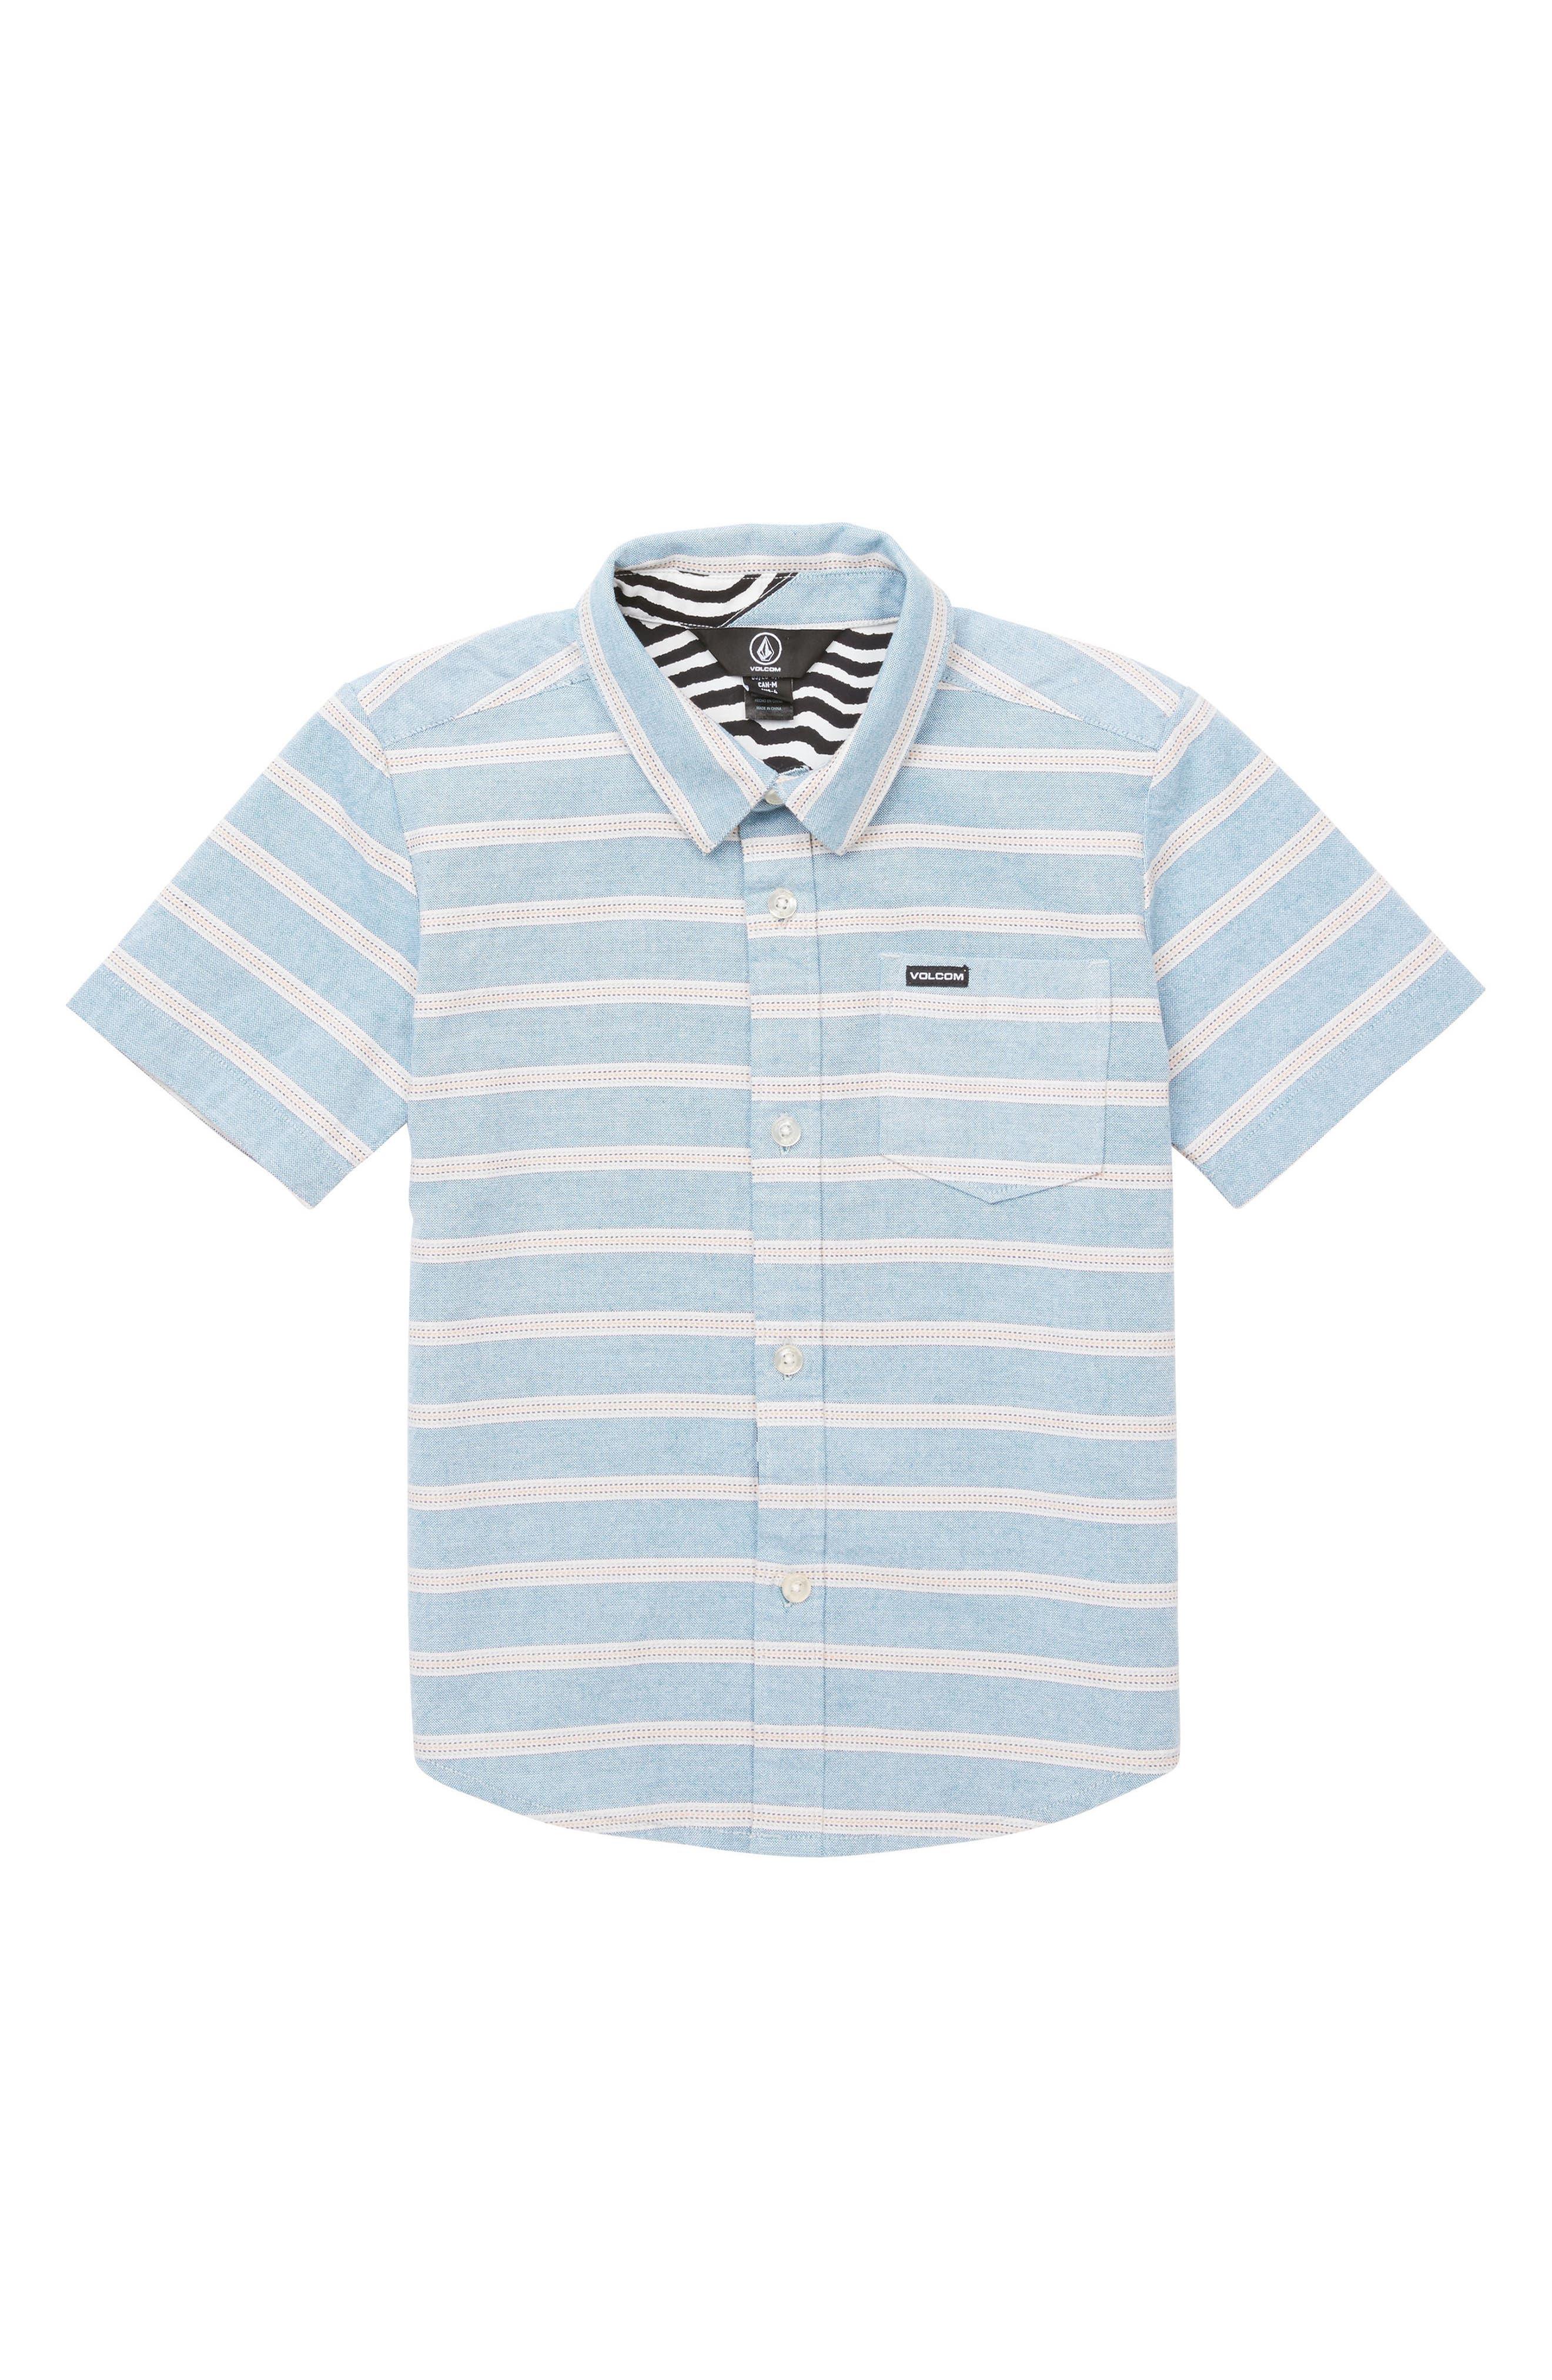 Branson Stripe Woven Shirt,                             Main thumbnail 1, color,                             400